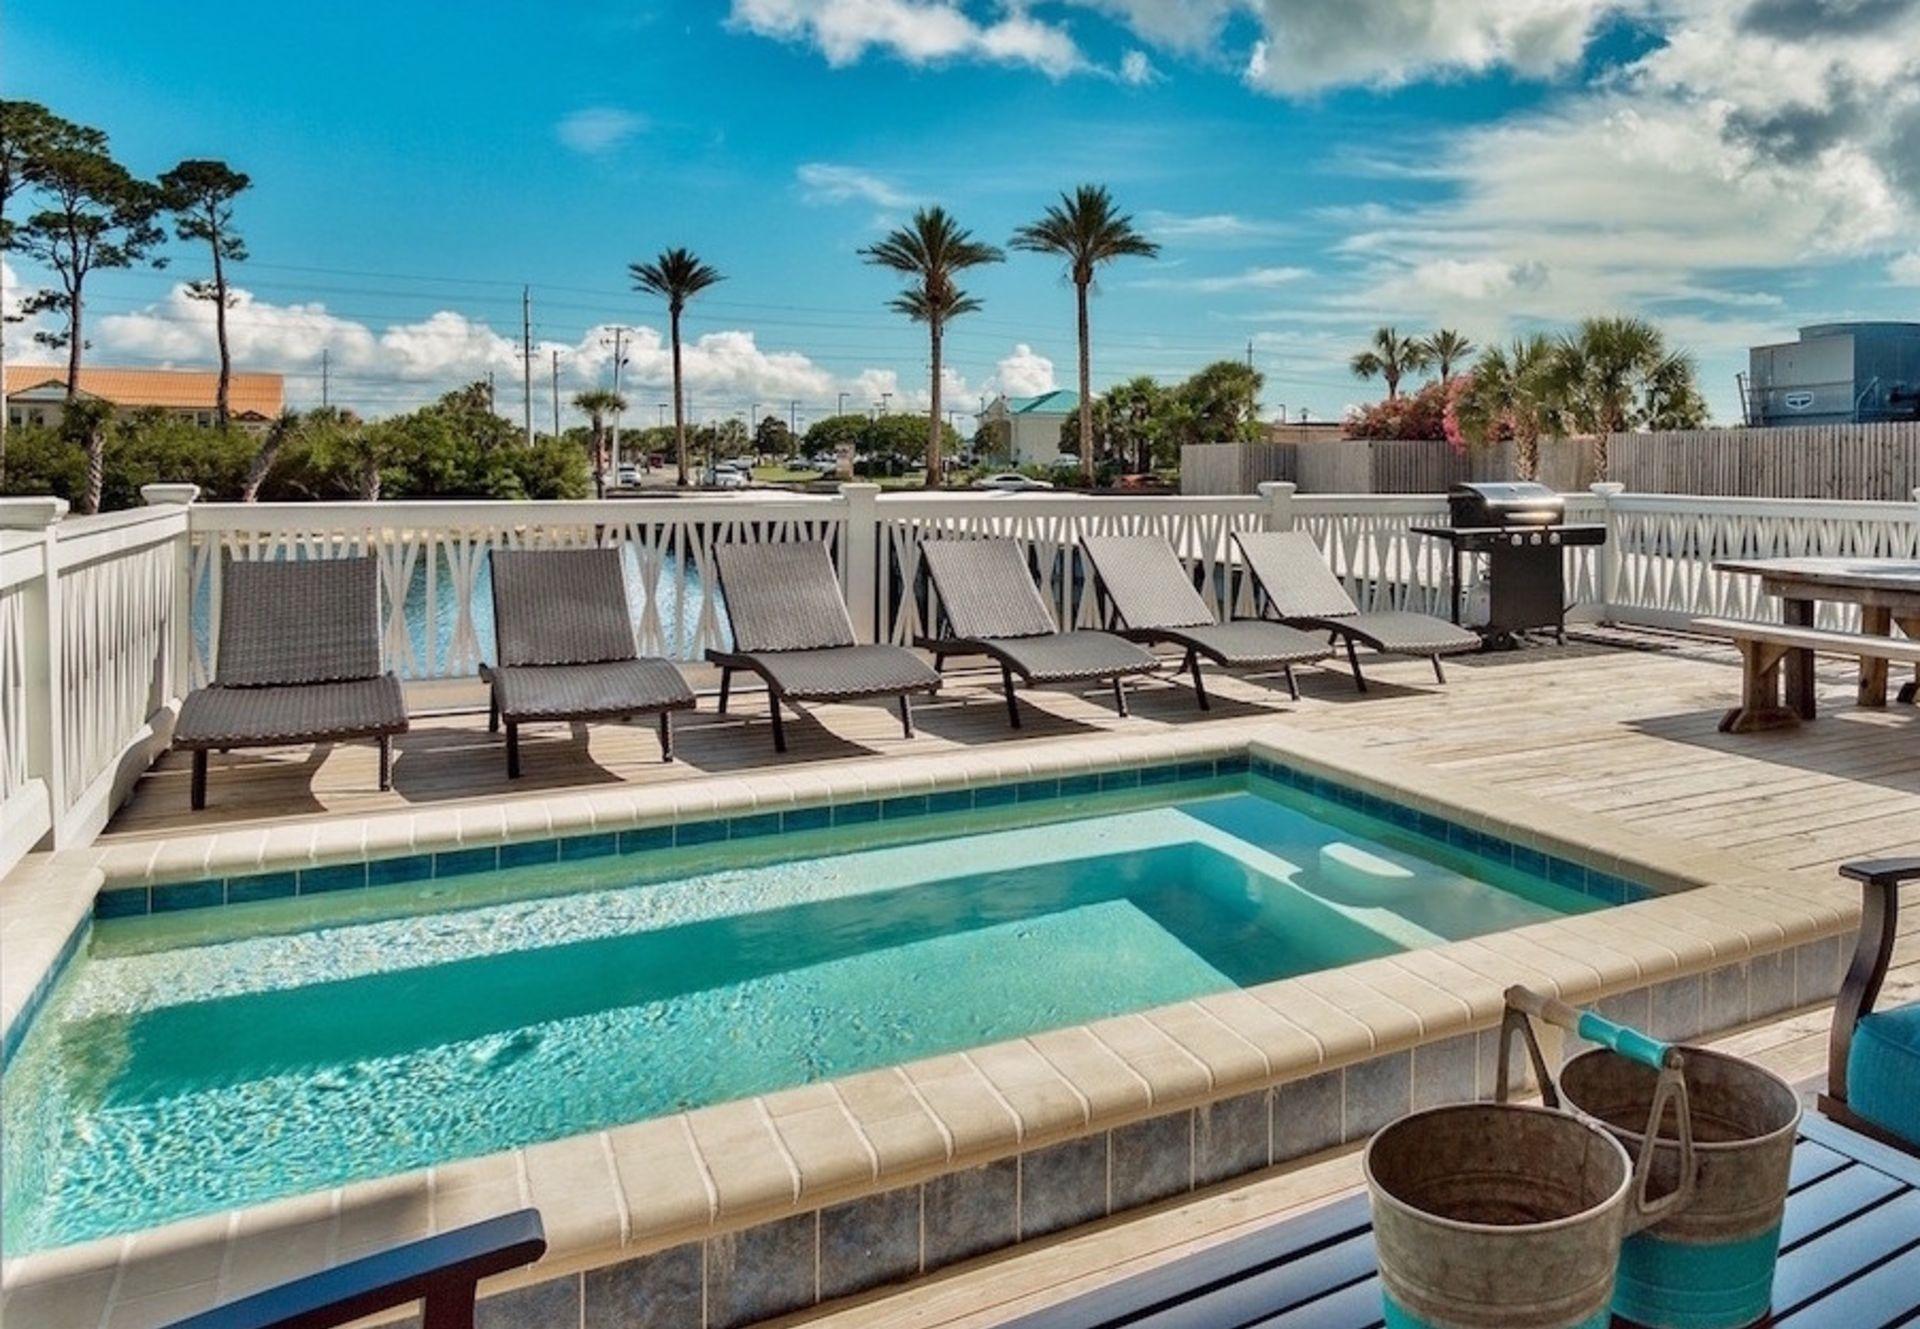 Best Million Dollar Vacation Homes On The Market In Destin